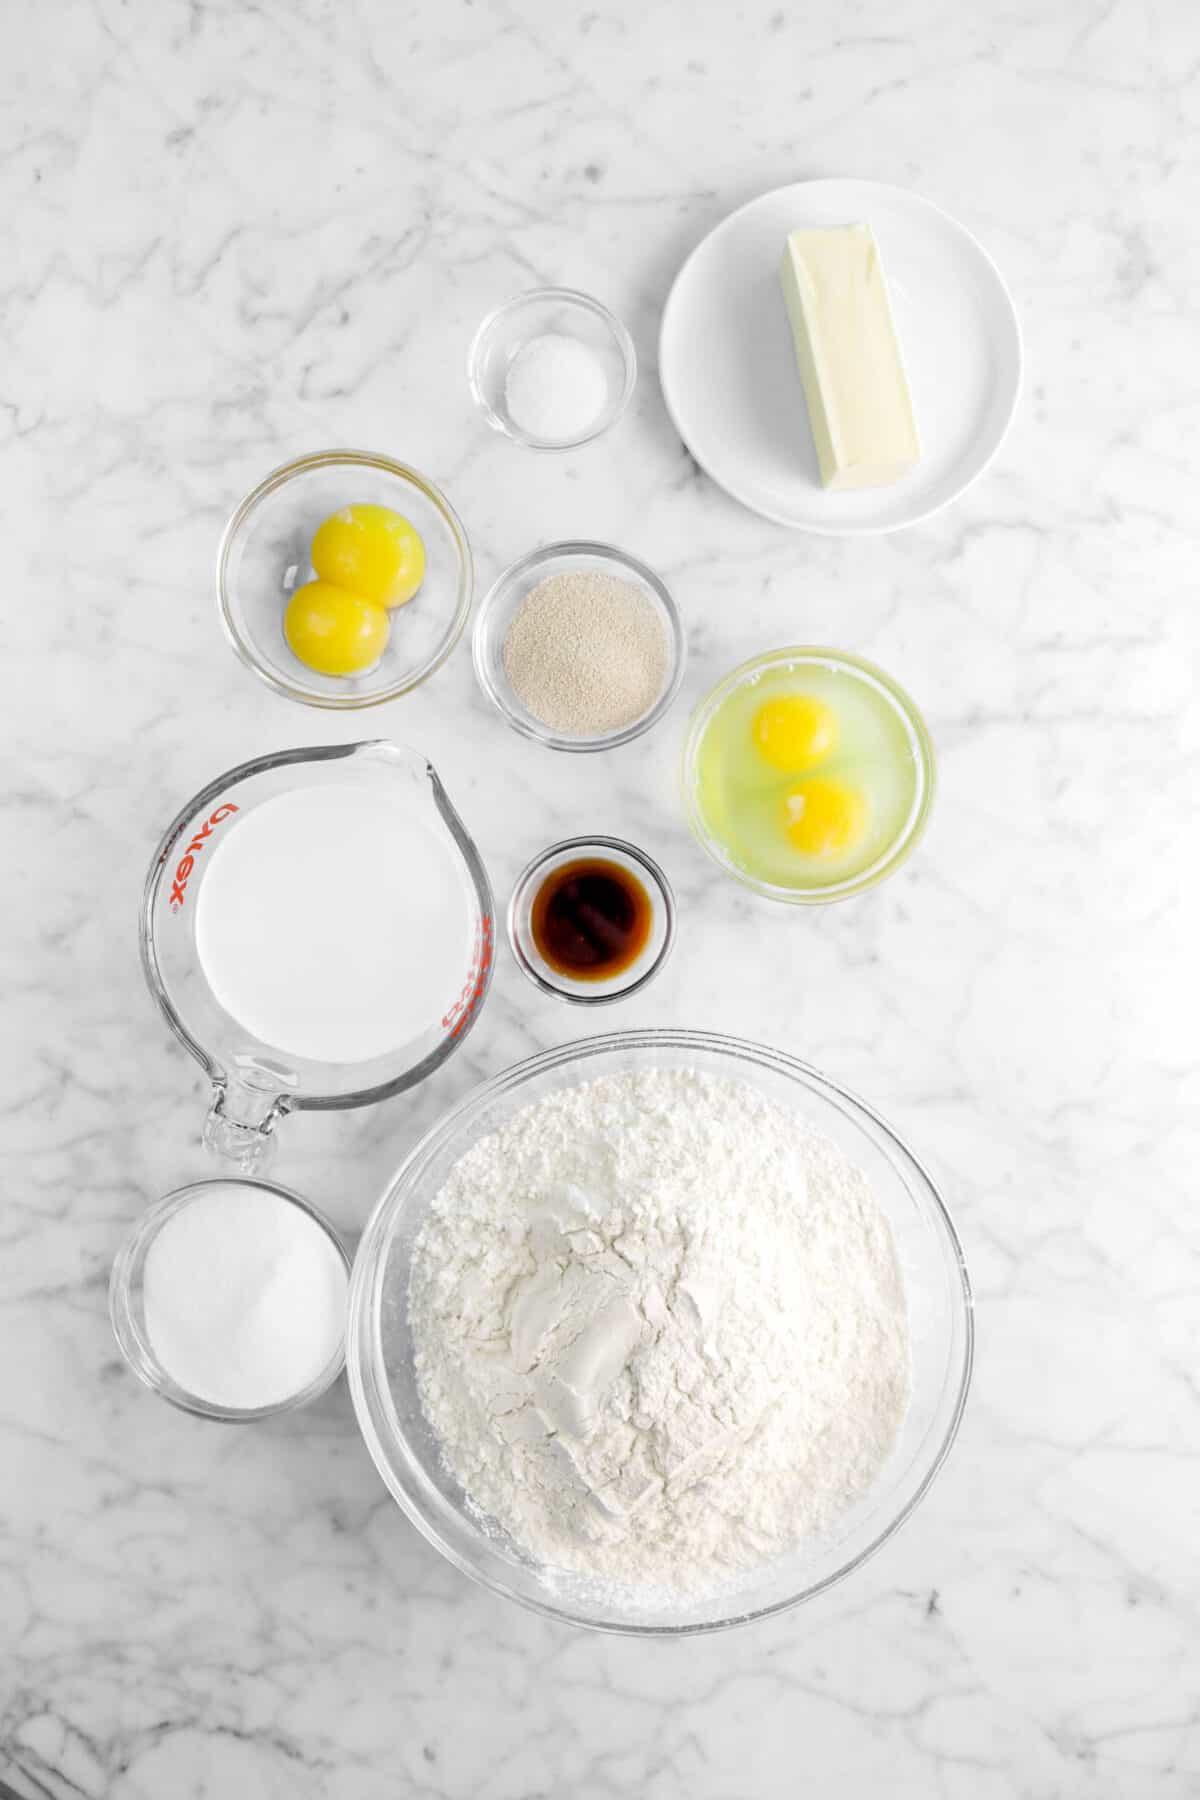 butter, salt, yeast, egg yolks, eggs, vanilla, milk, sugar, and flour on a marble counter